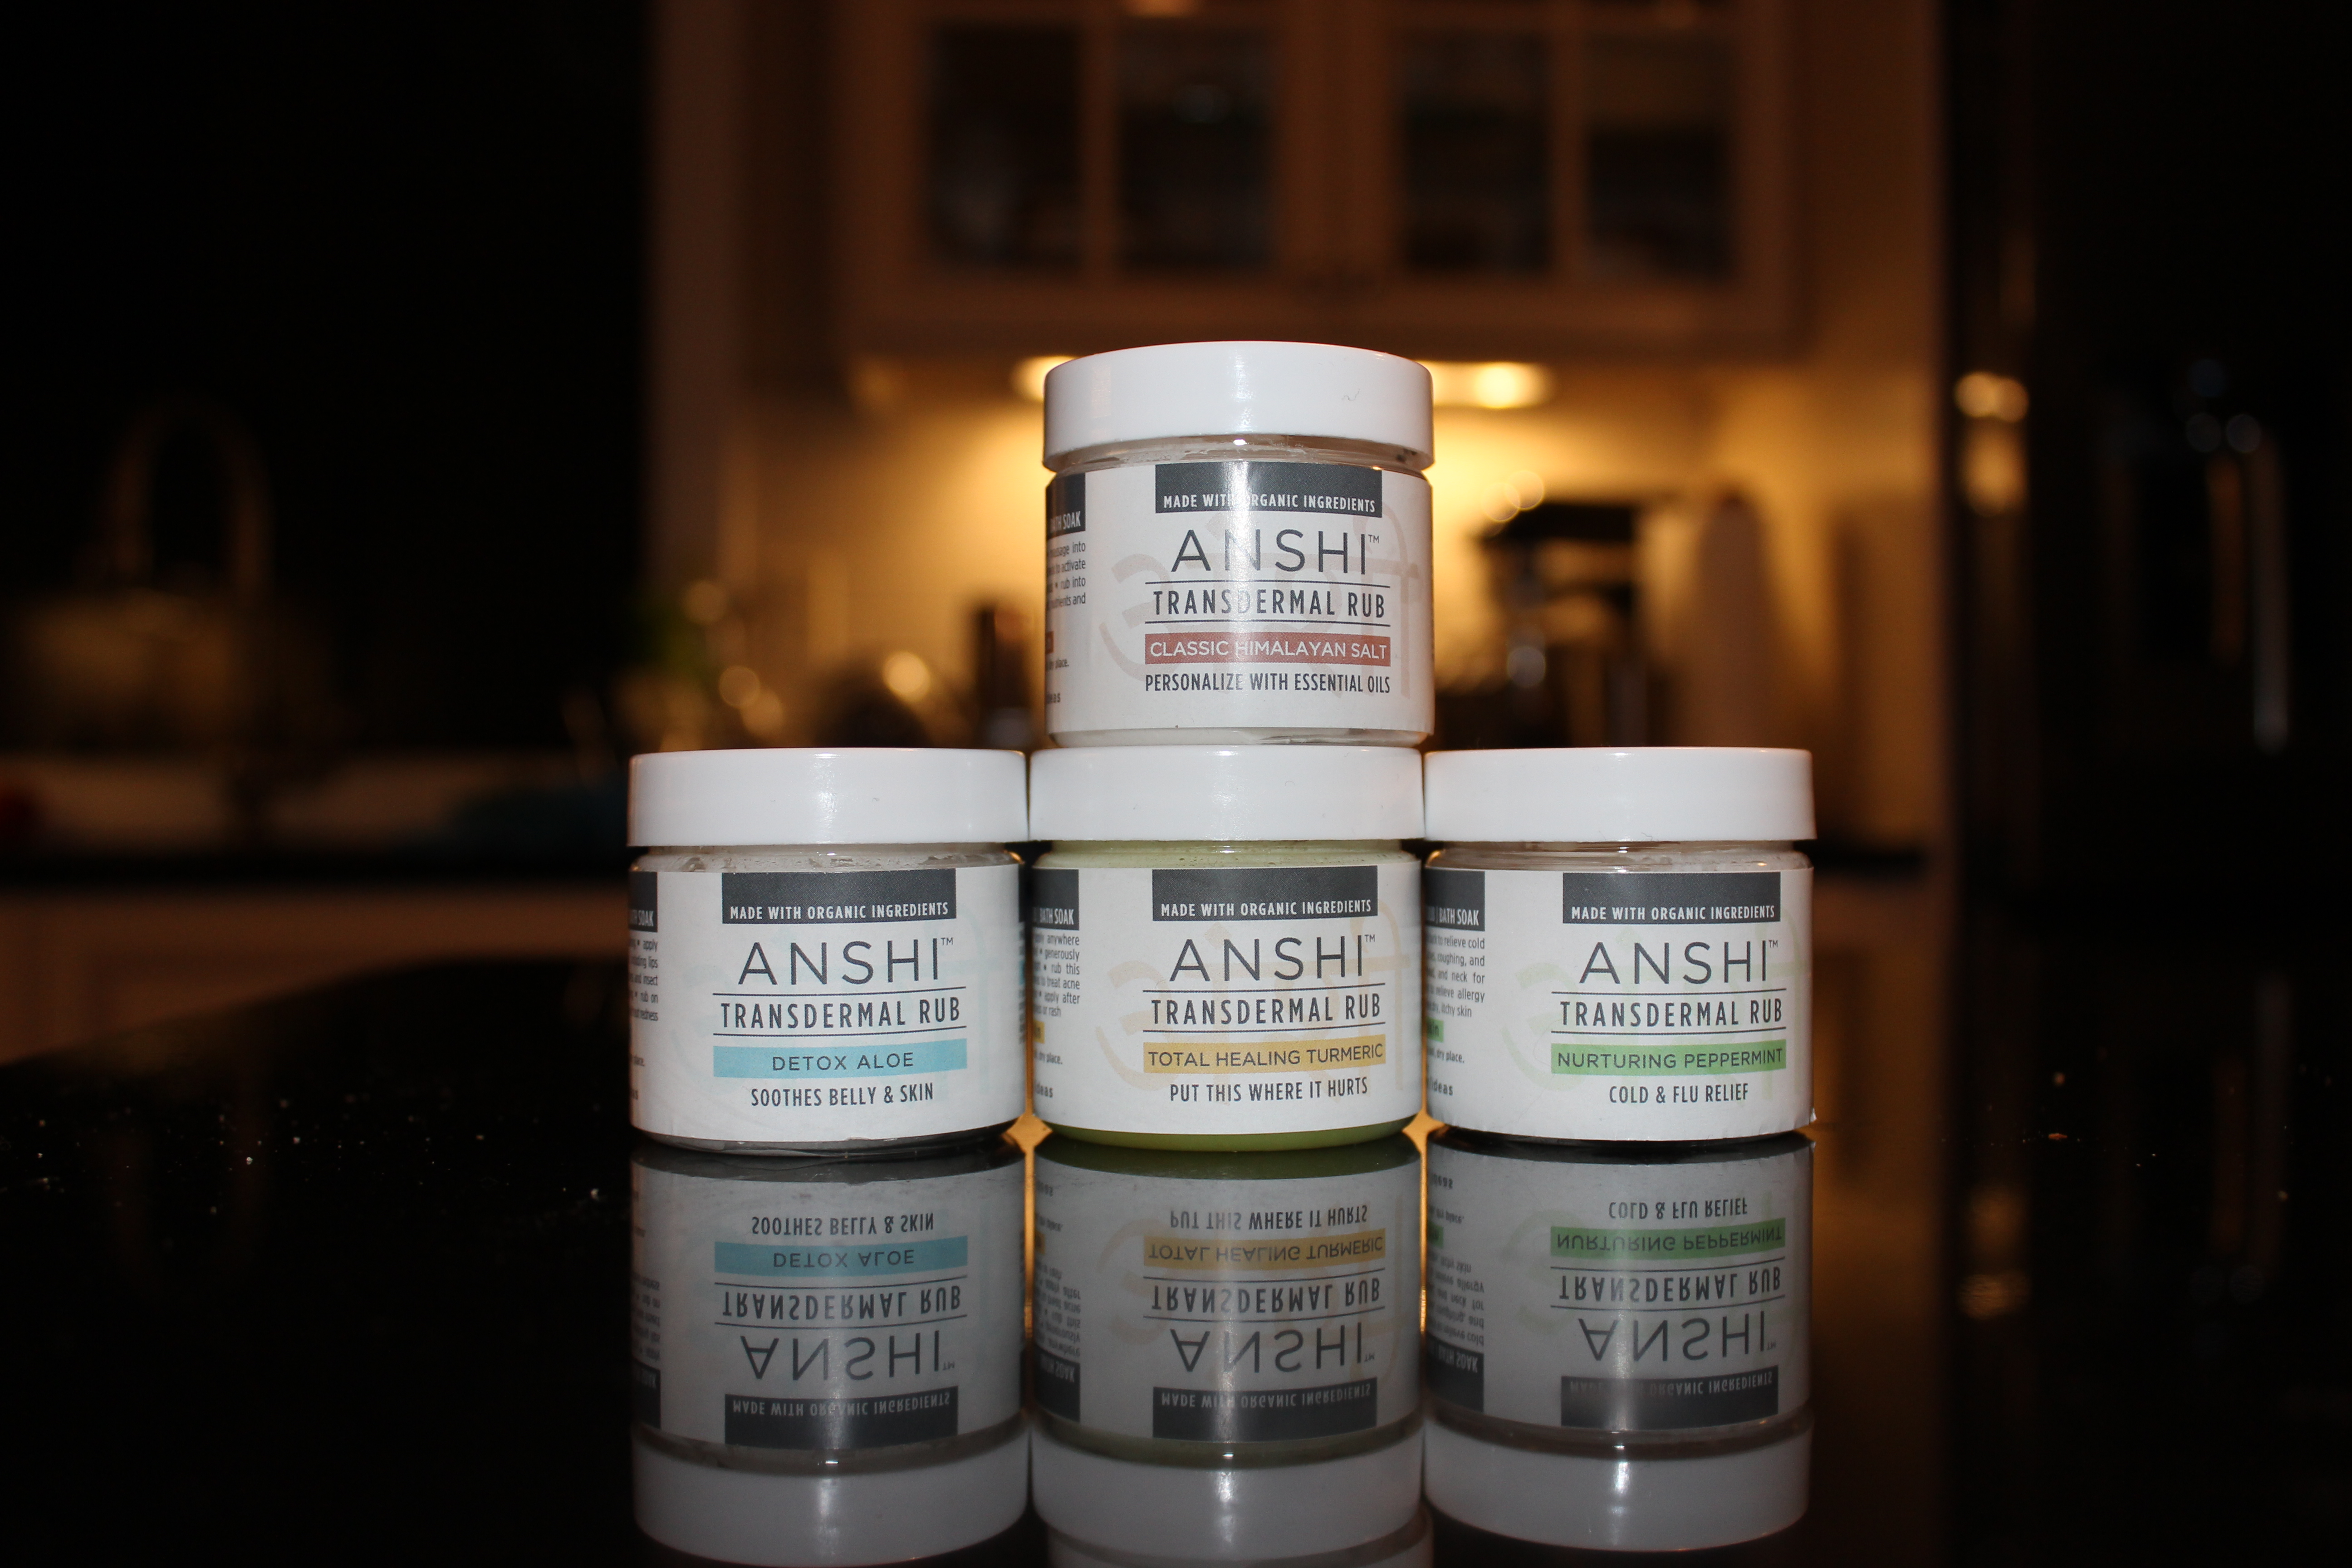 ANSHI - A Modern Line of Natural Medicine & Toxin-Free Skincare